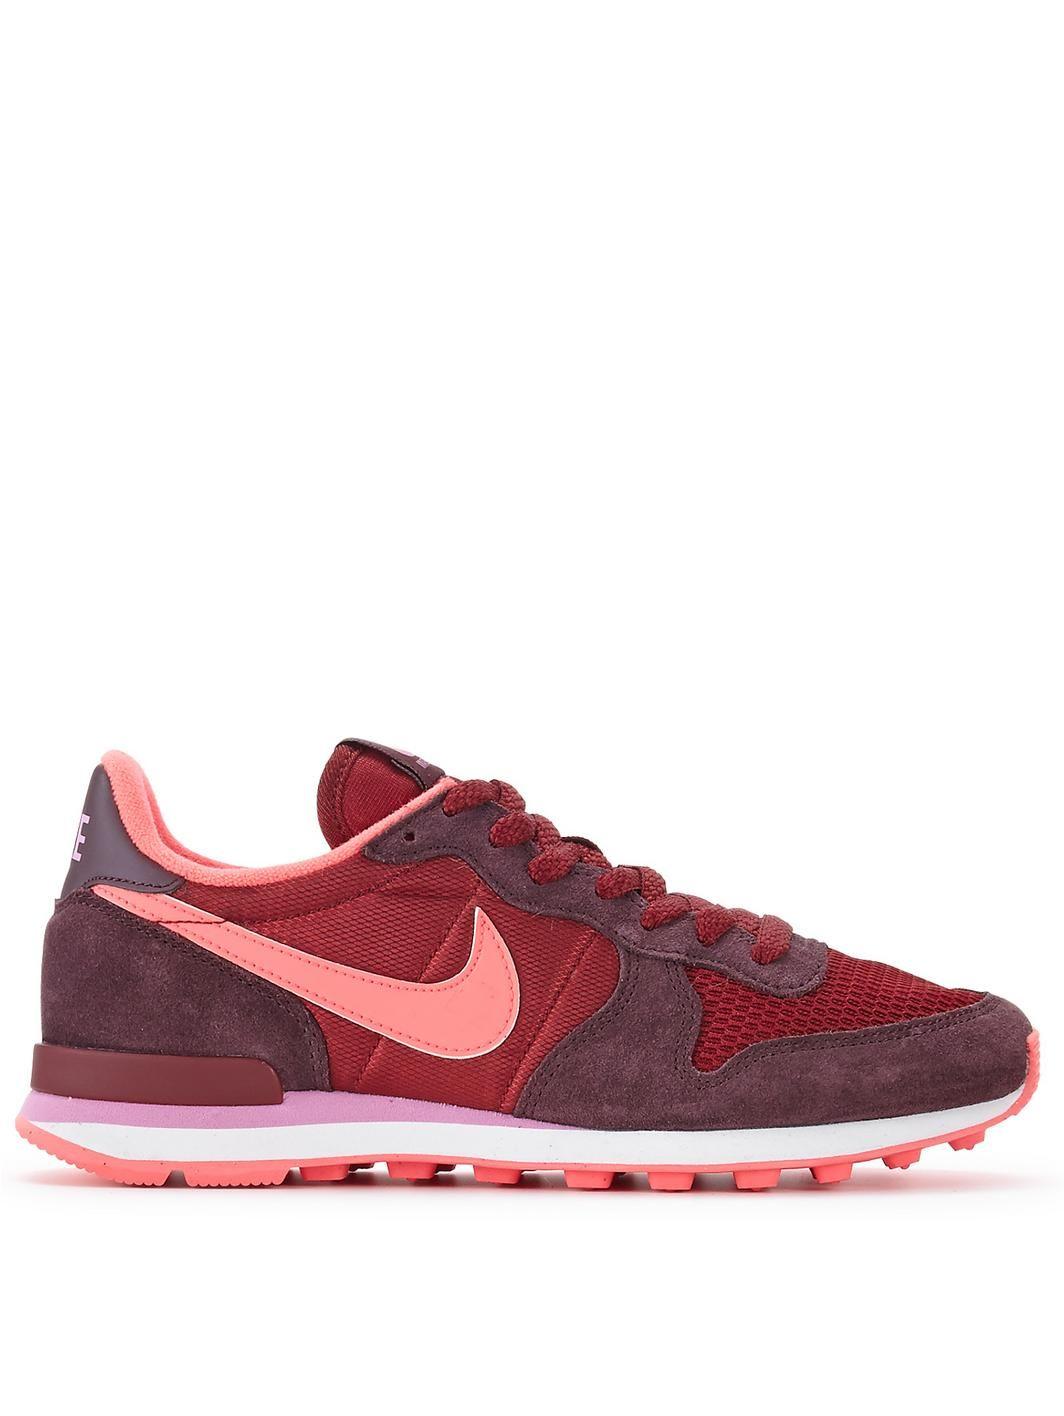 d83729336b2764 Nike Internationalist Trainers - Womens Trainers - COLOUR-burgundy orange